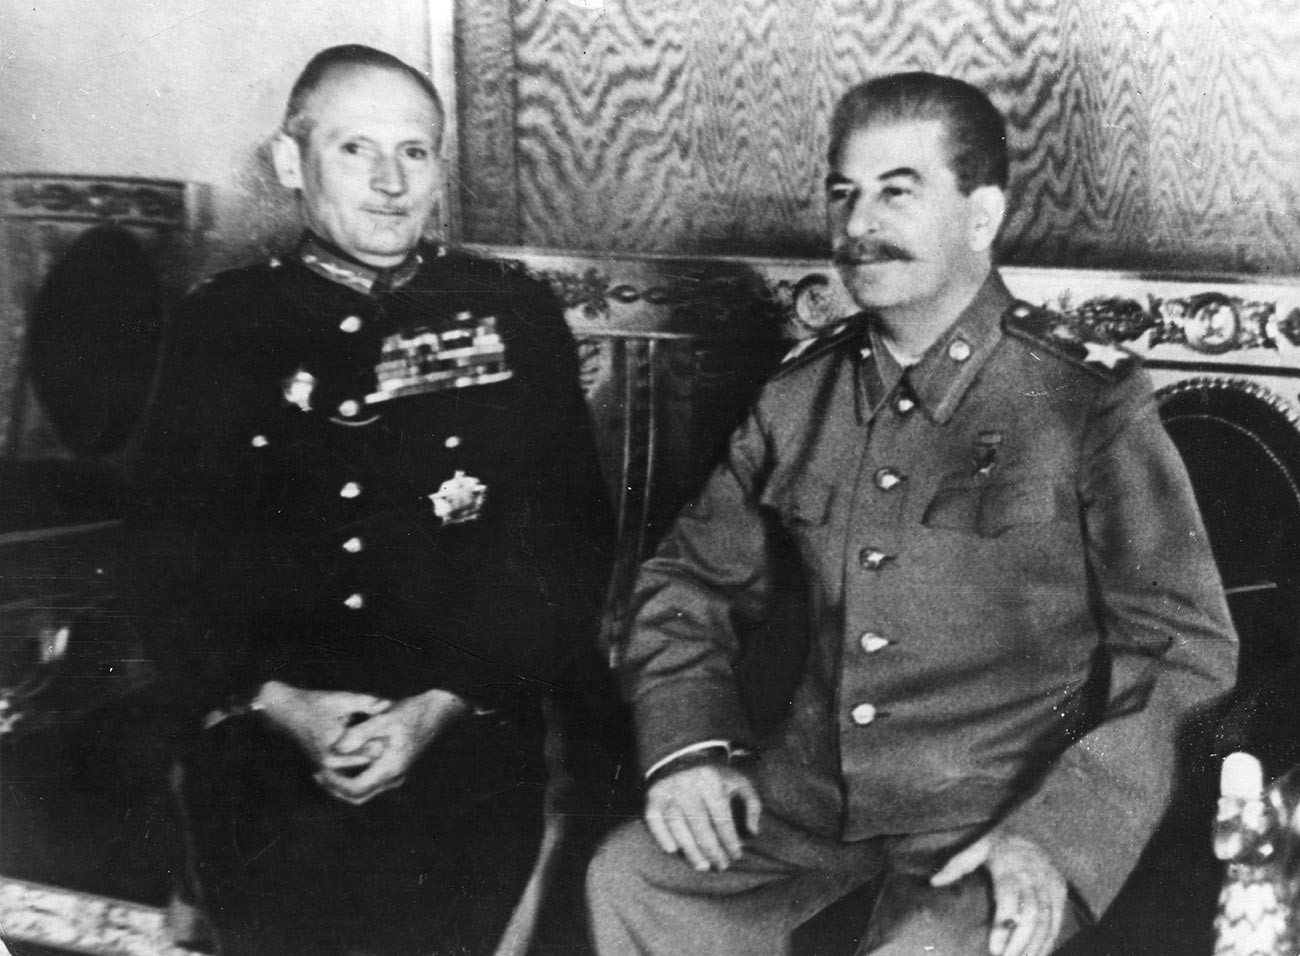 Marsekal Lapangan Inggris Marshal Bernard L. Montgomery (mengenakan 'TOrde Kemenangan) dan Josef Stalin.